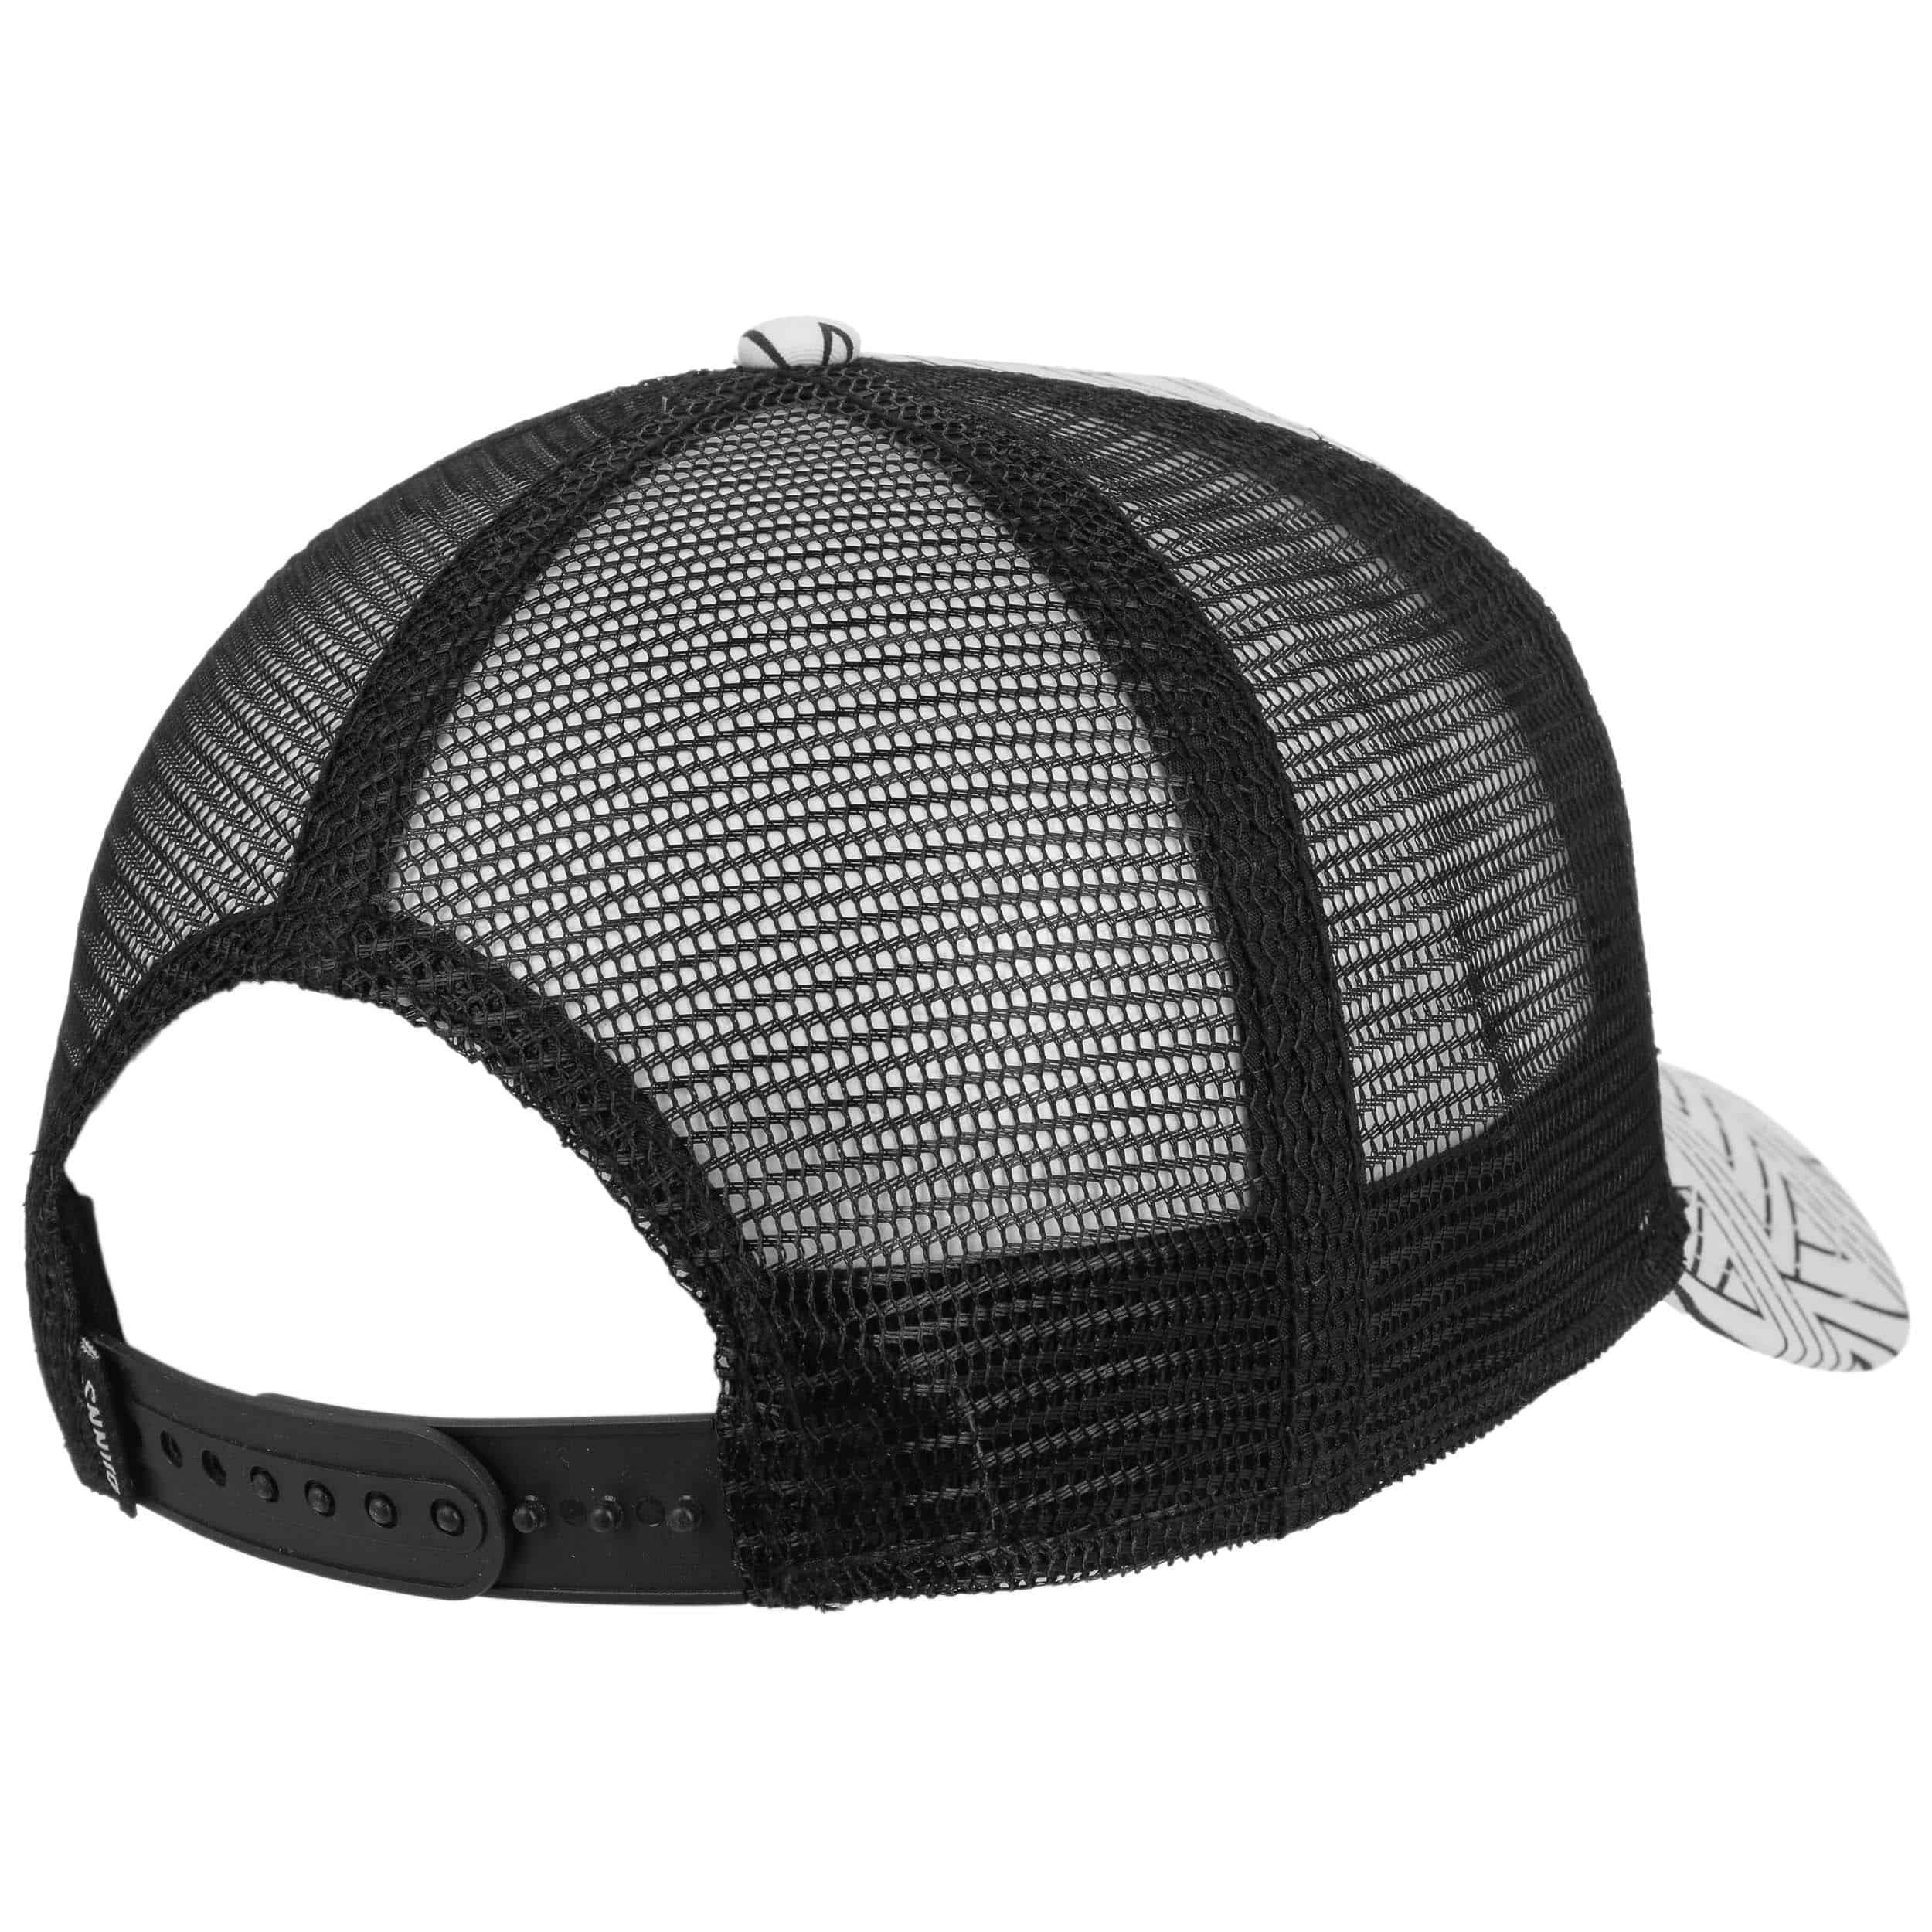 conlines hft trucker cap by djinns gbp 19 95 hats. Black Bedroom Furniture Sets. Home Design Ideas